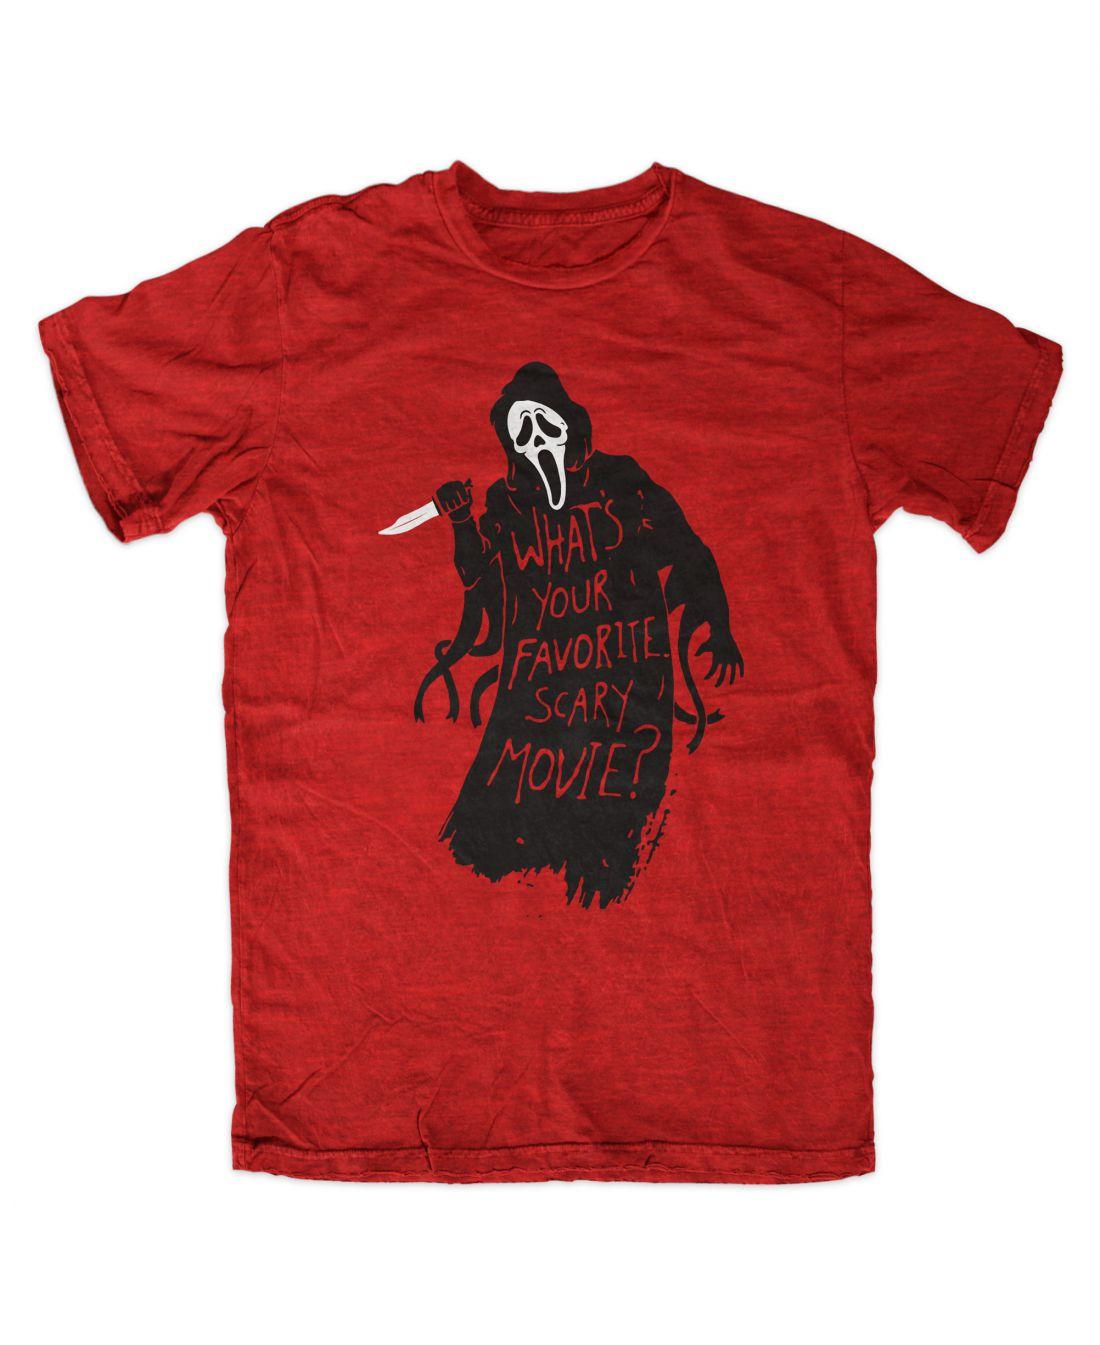 Favorite Scary Movie (antique red póló)